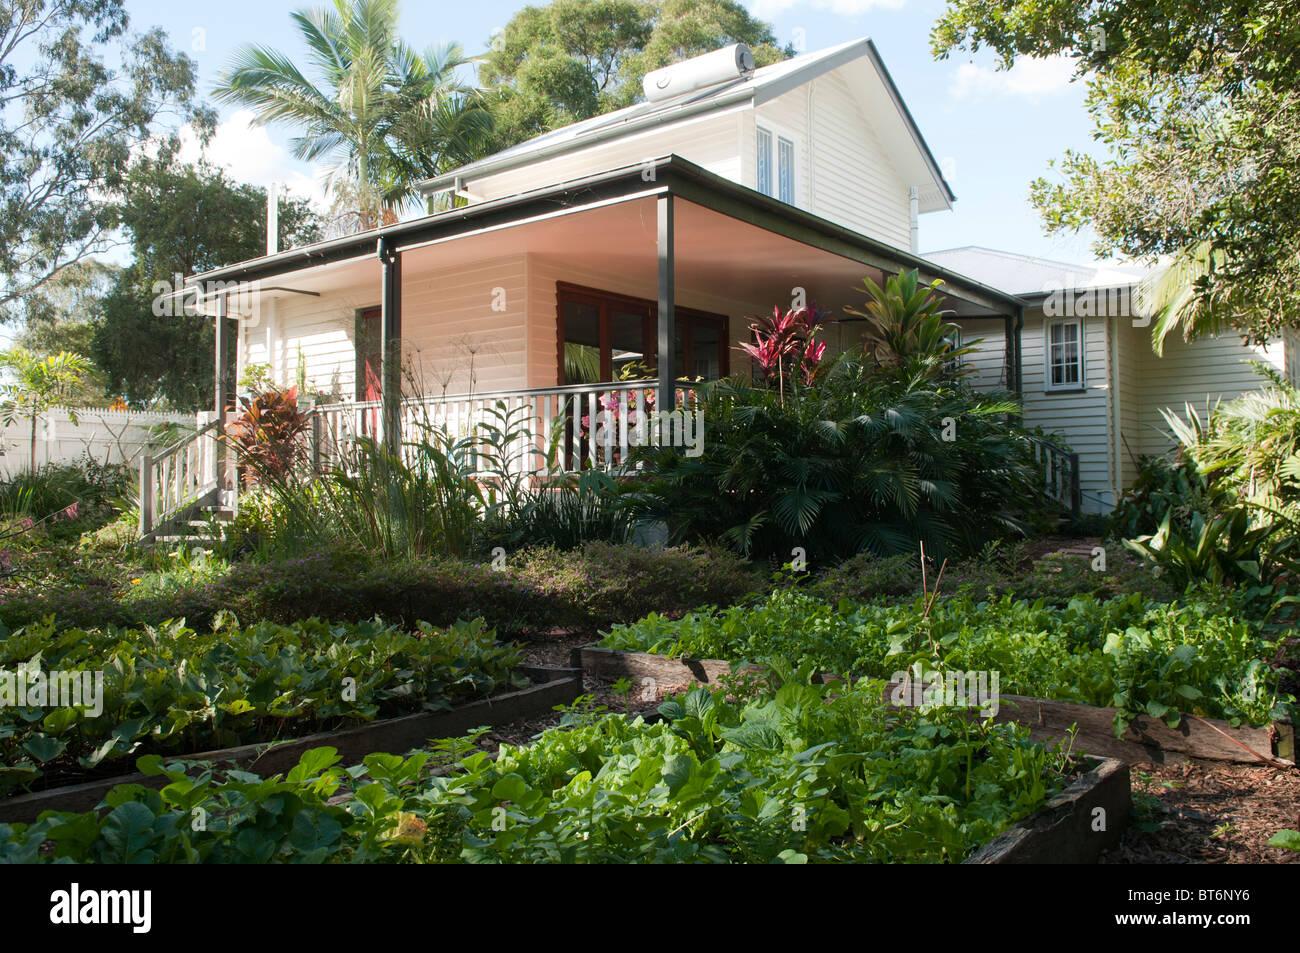 Vegetable garden and suburban home, Brisbane, Queensland, Australia - Stock Image